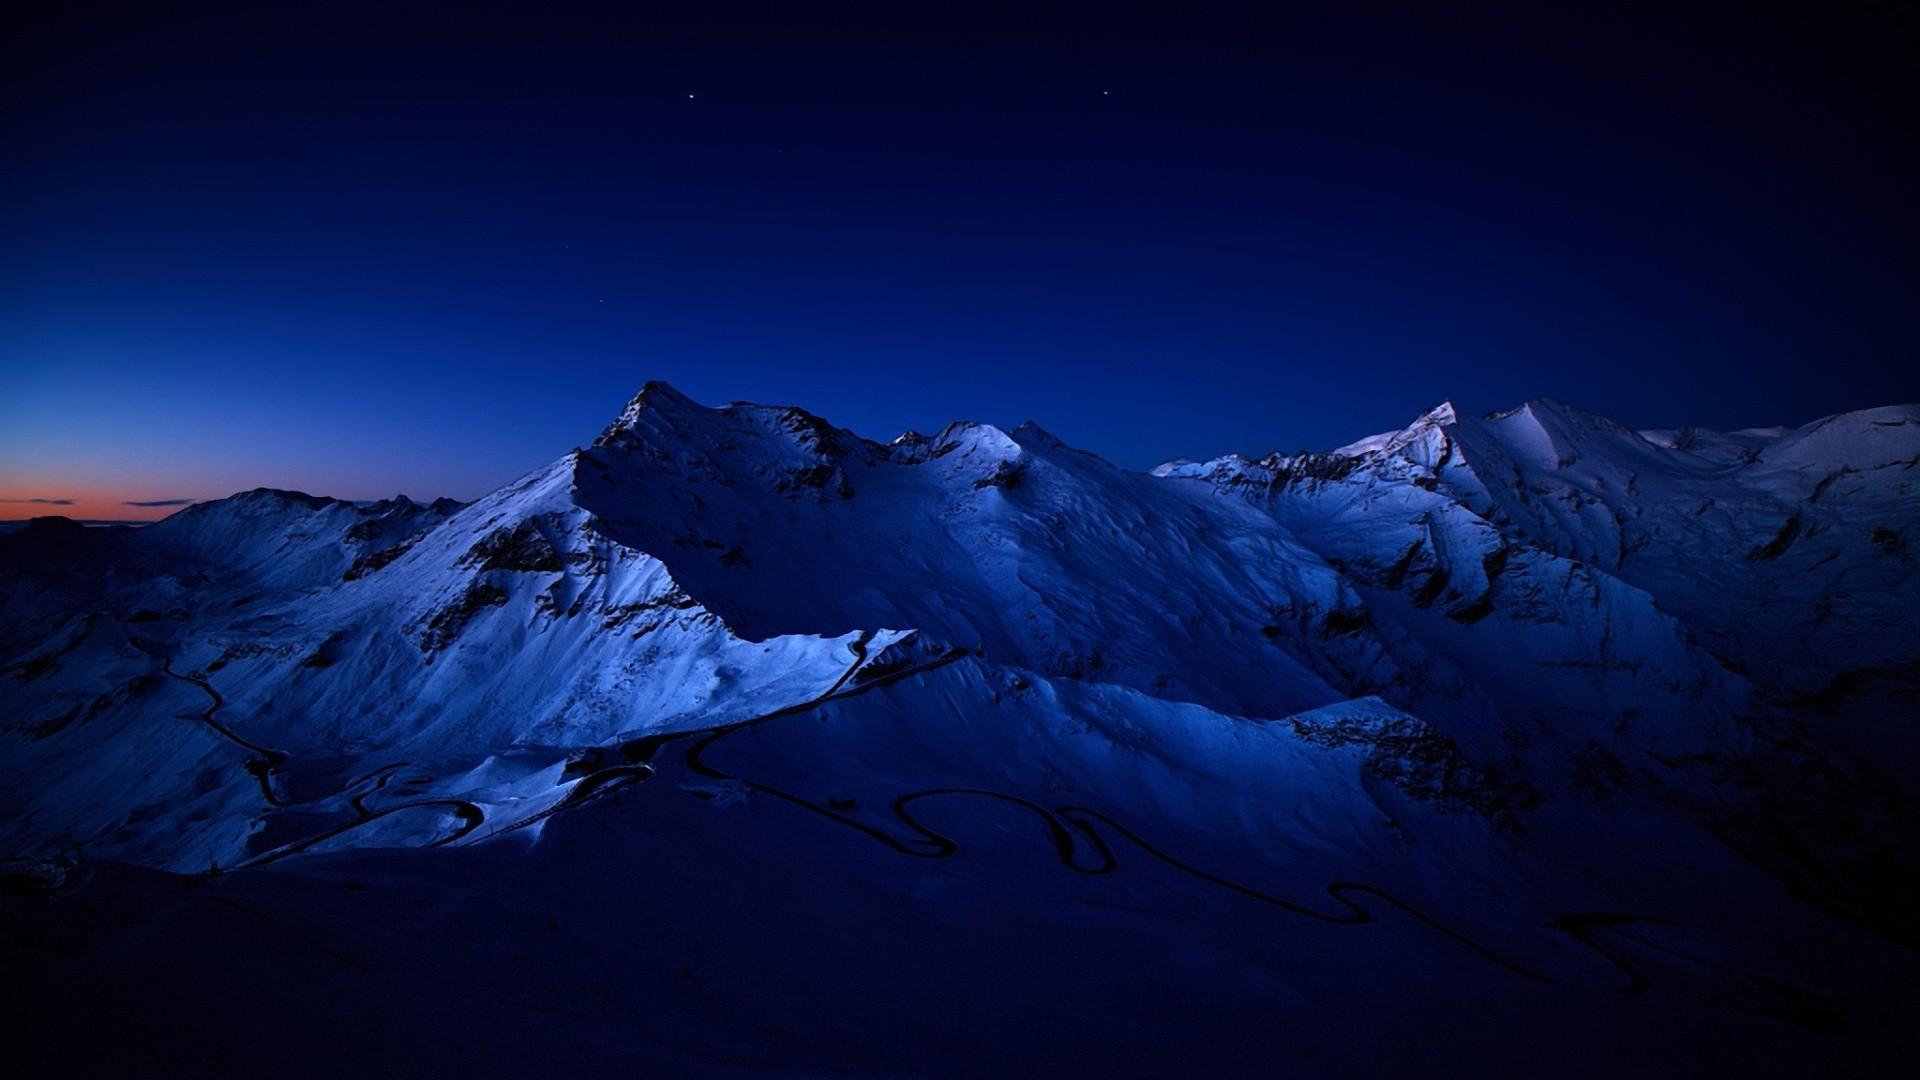 Beautiful Mountain Range Wallpaper